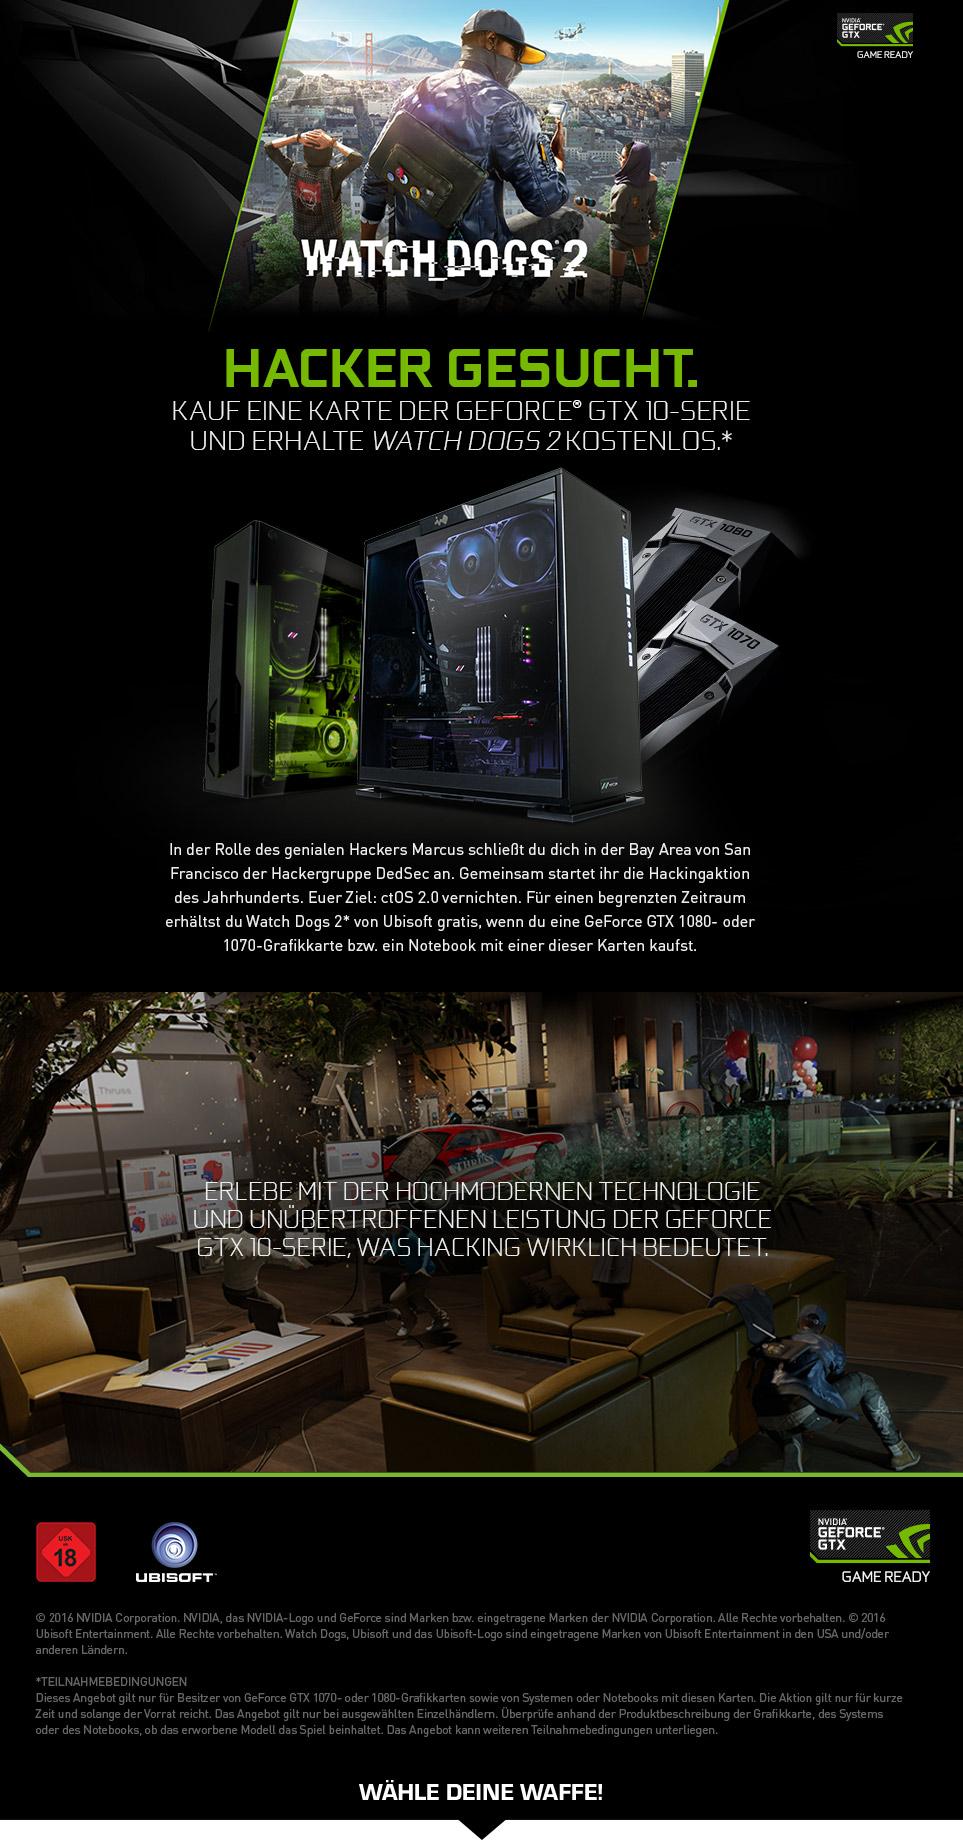 Gaming PCs mit NVIDIA Watch_Dogs 2 Bundle